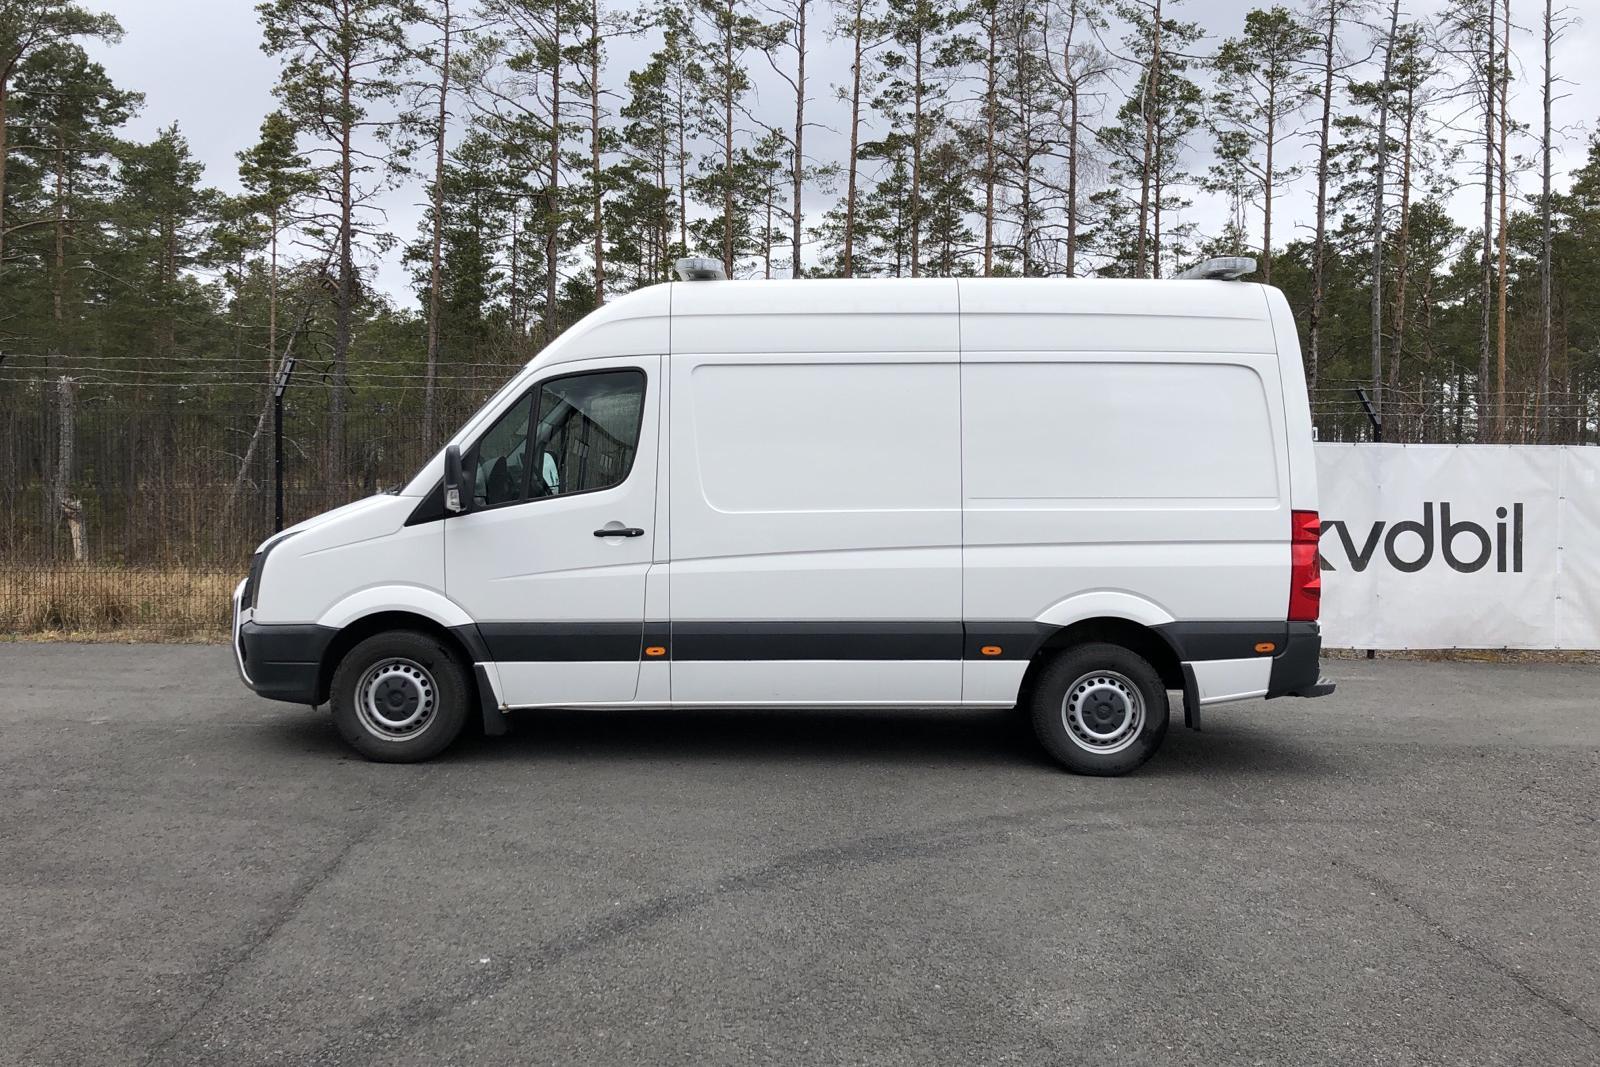 VW Crafter 35 2.0 TDI Skåp (163hk) - 143 300 km - Manual - white - 2014